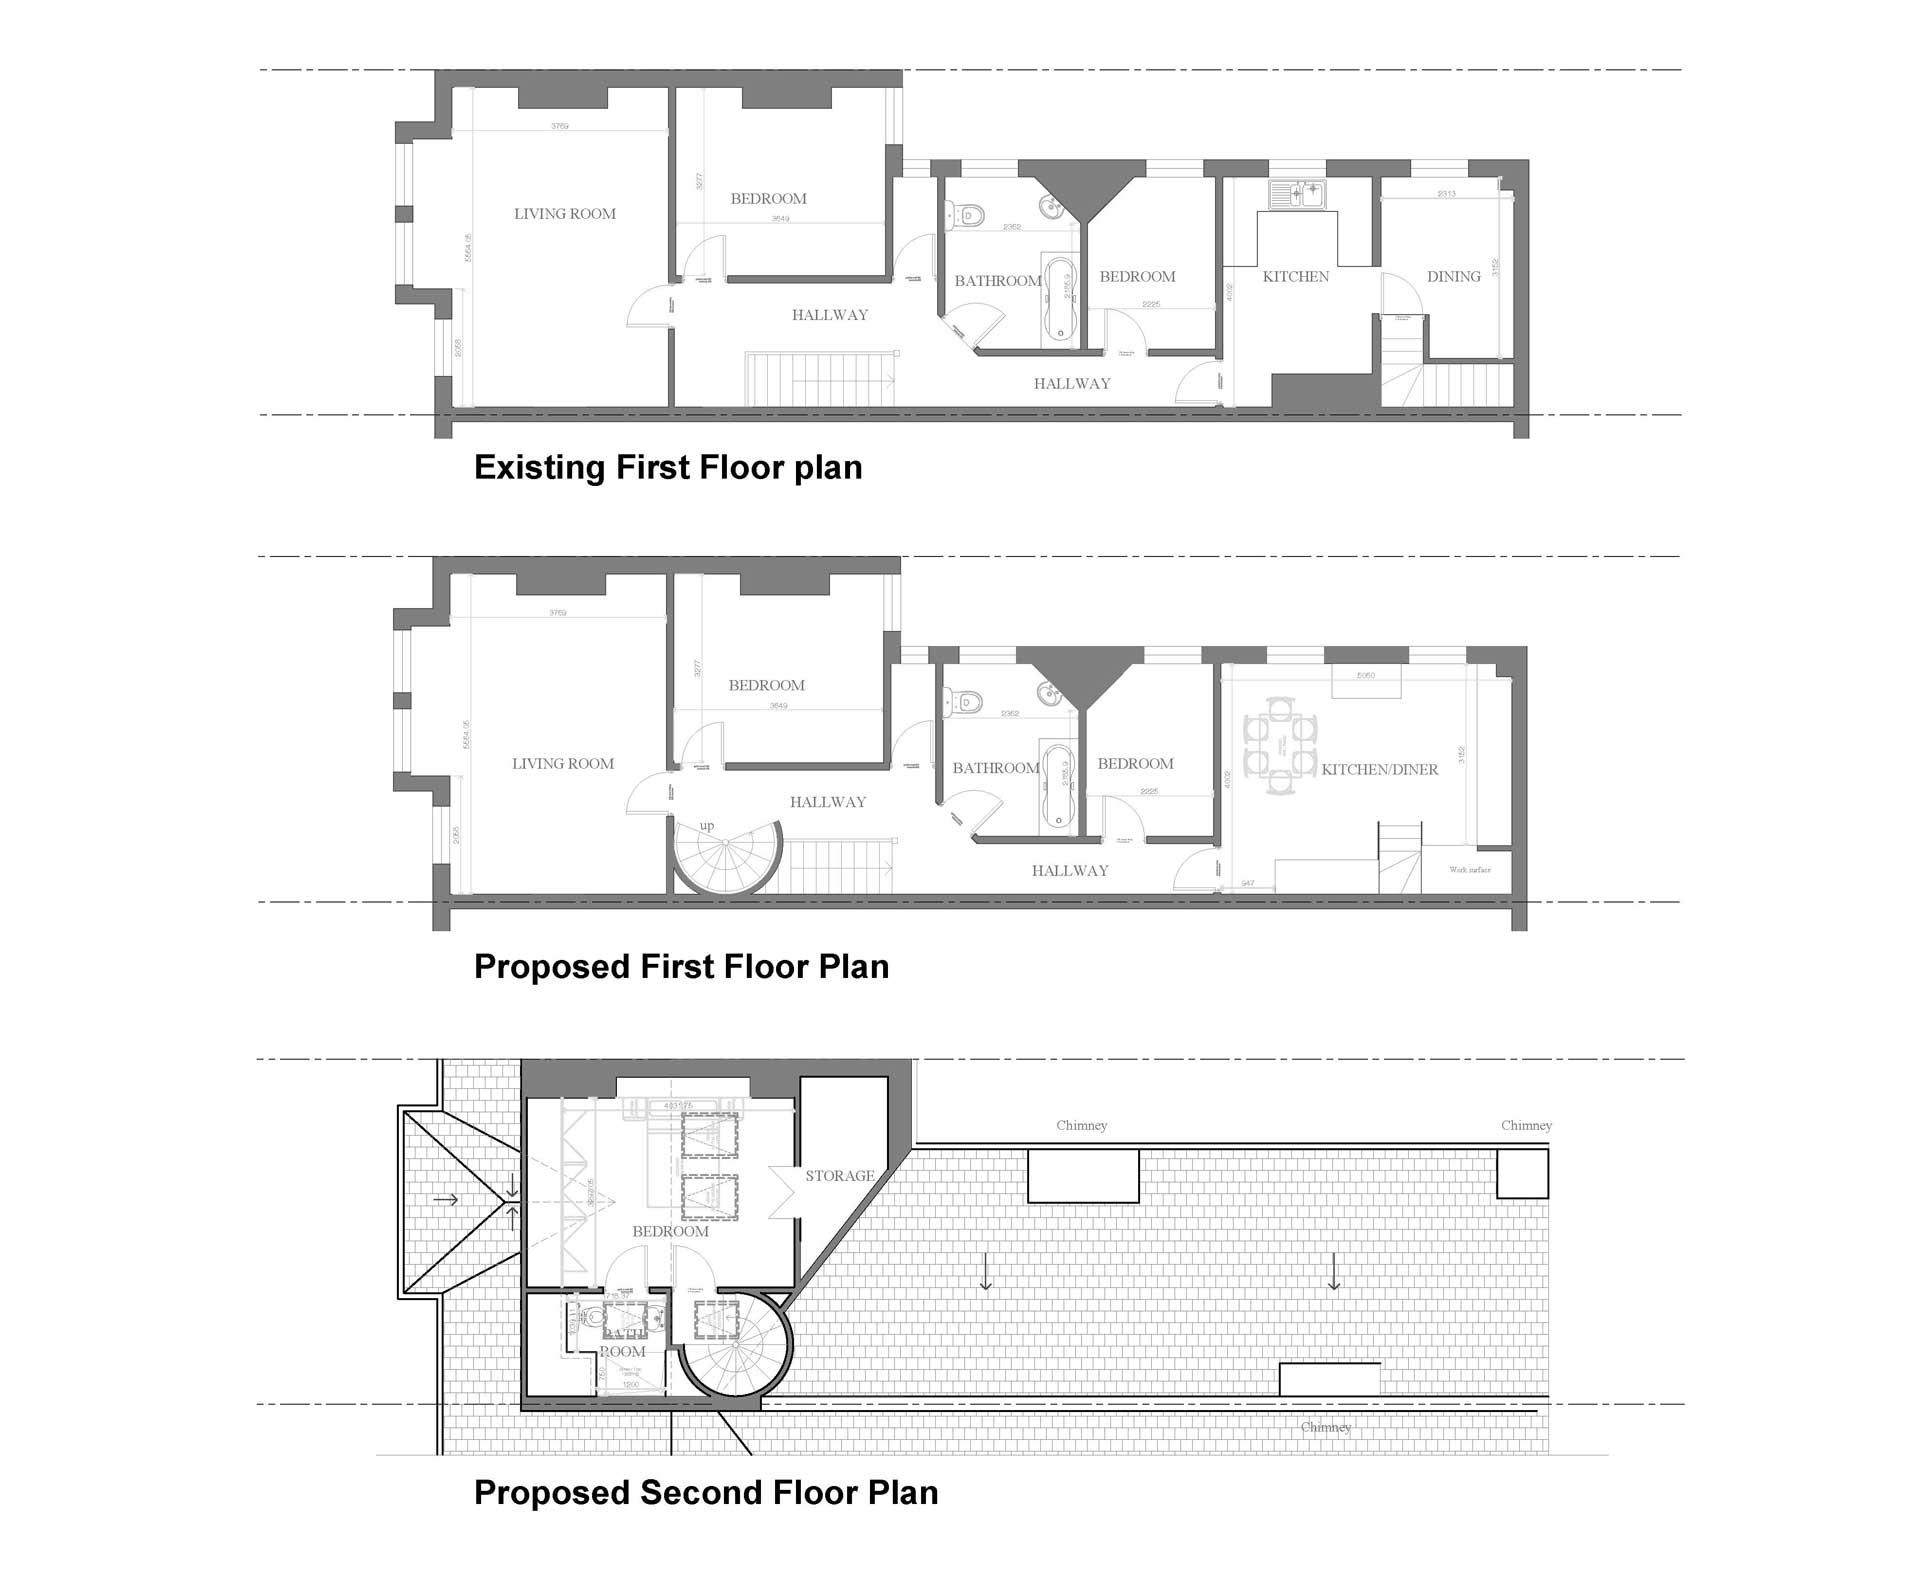 Lambeth-council-First-Floor-Plan